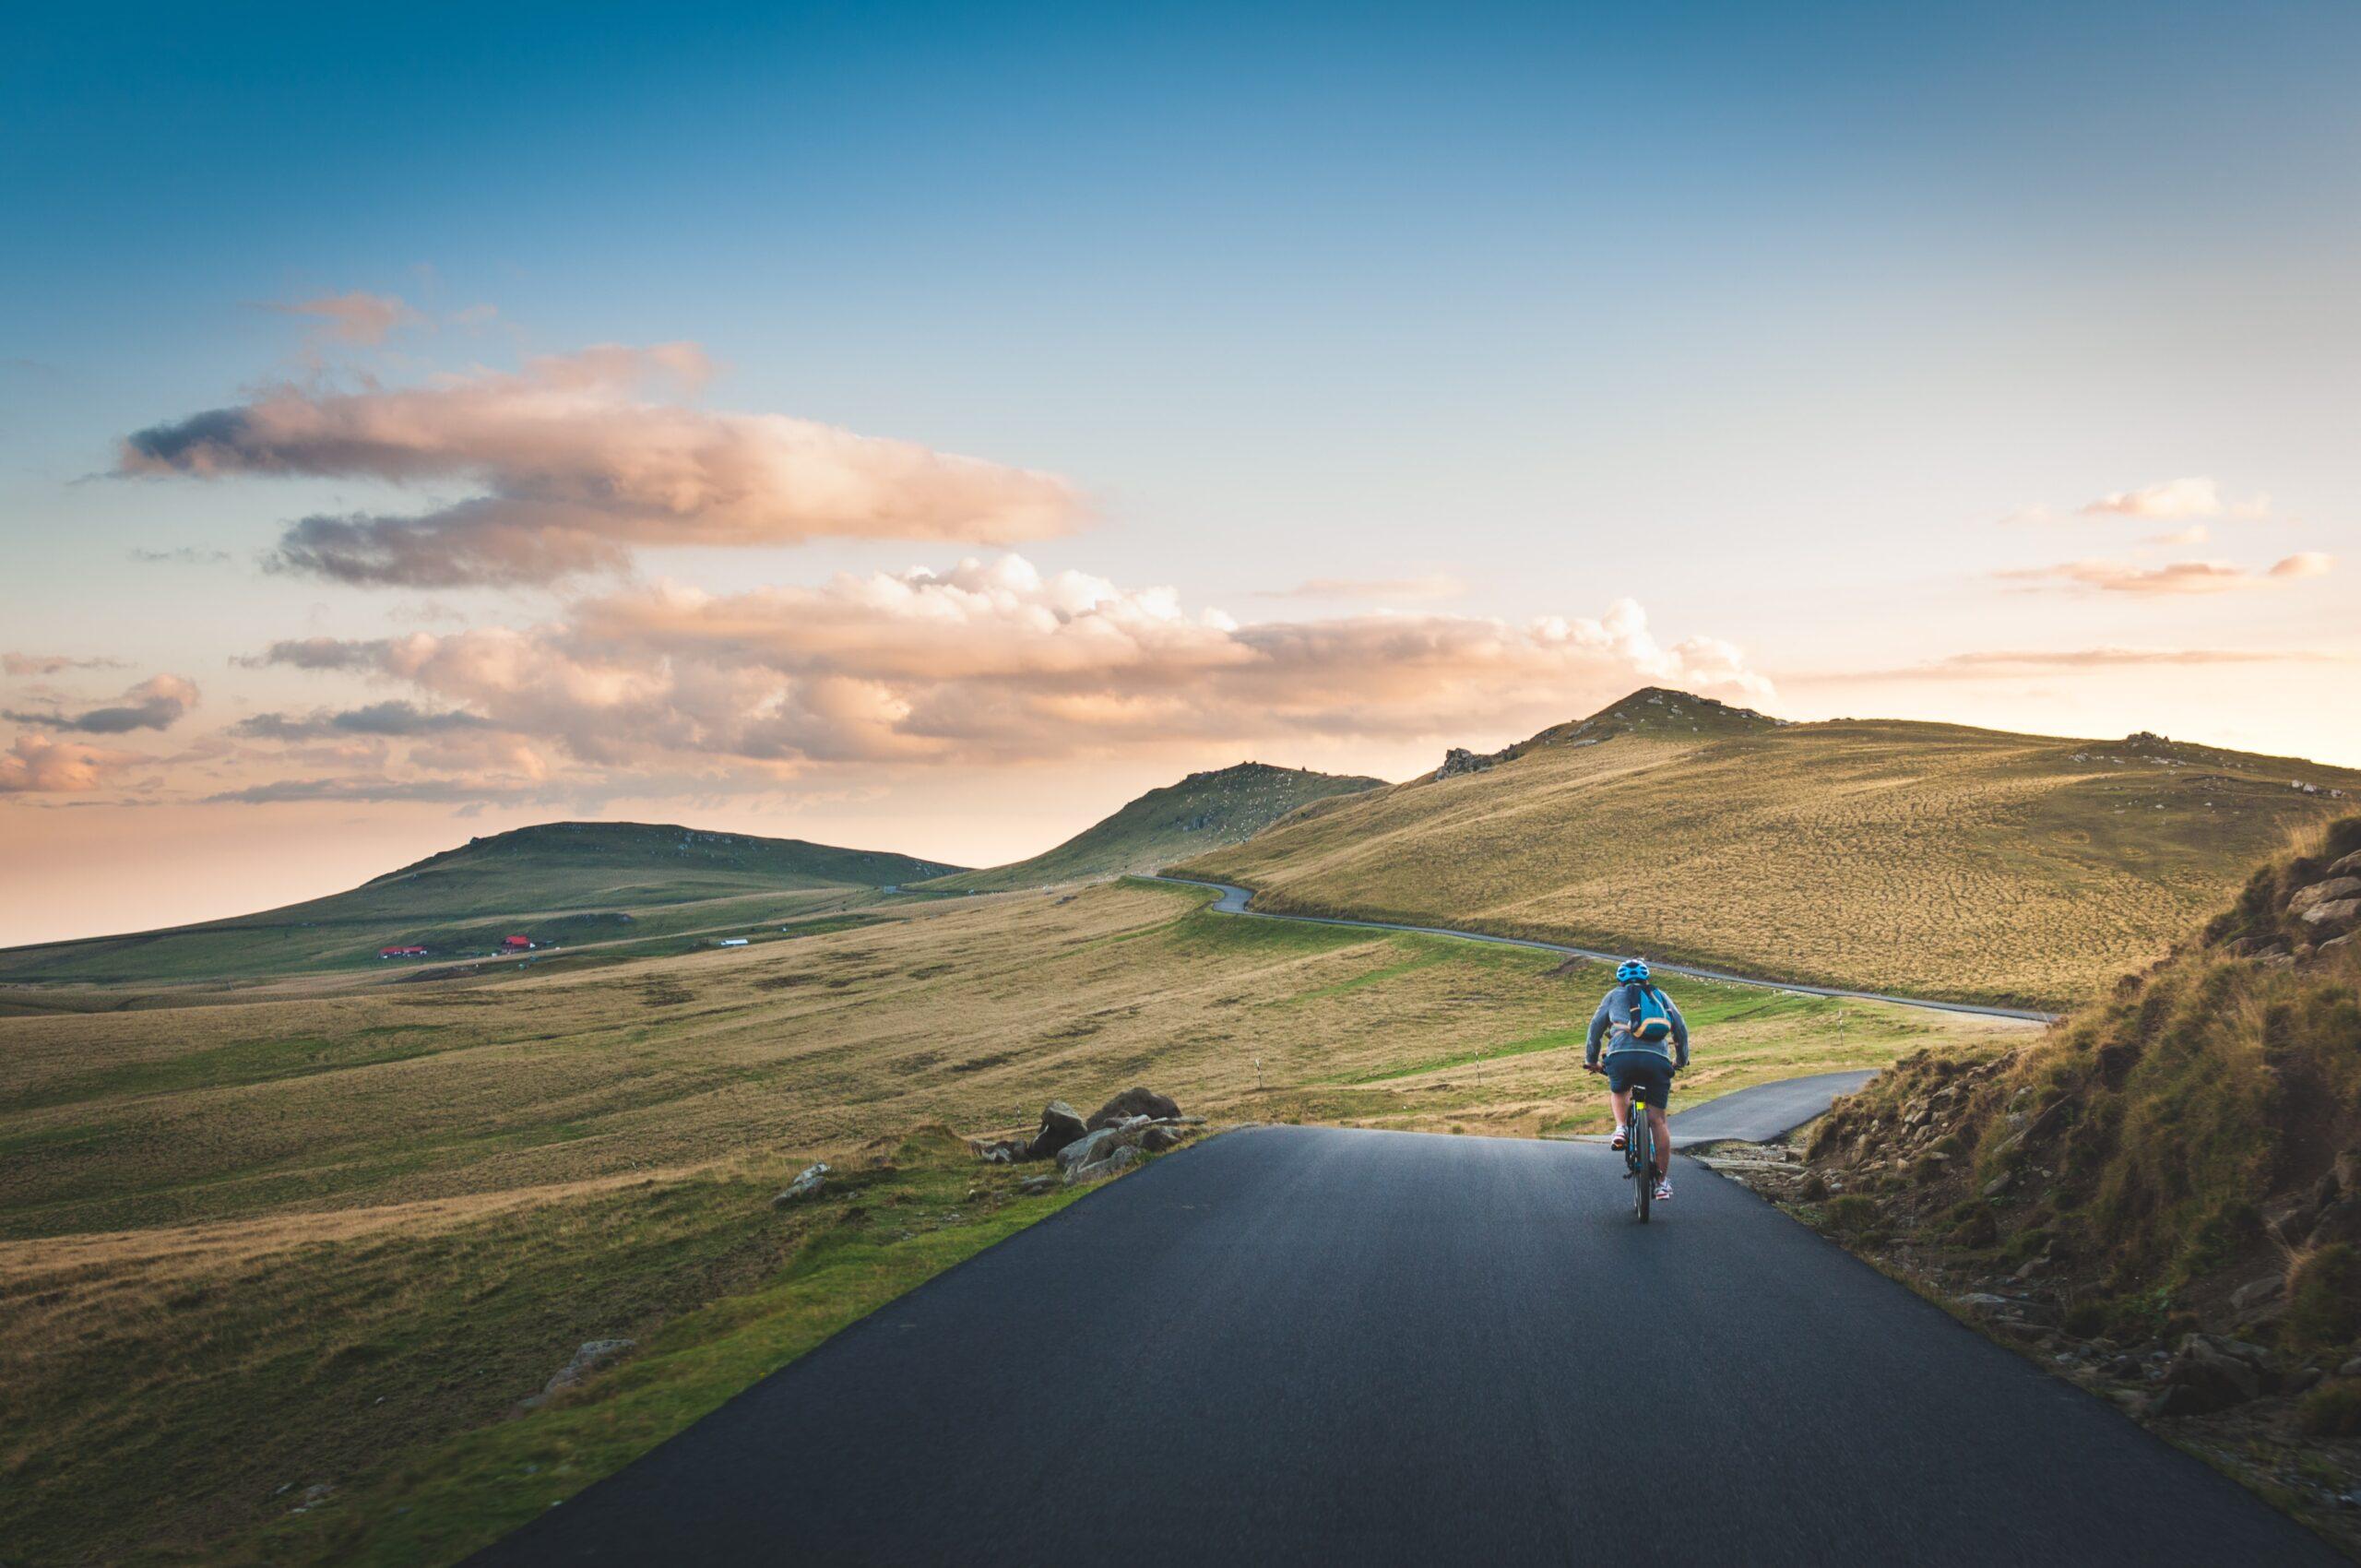 Celebrating National Bike Month June 2021